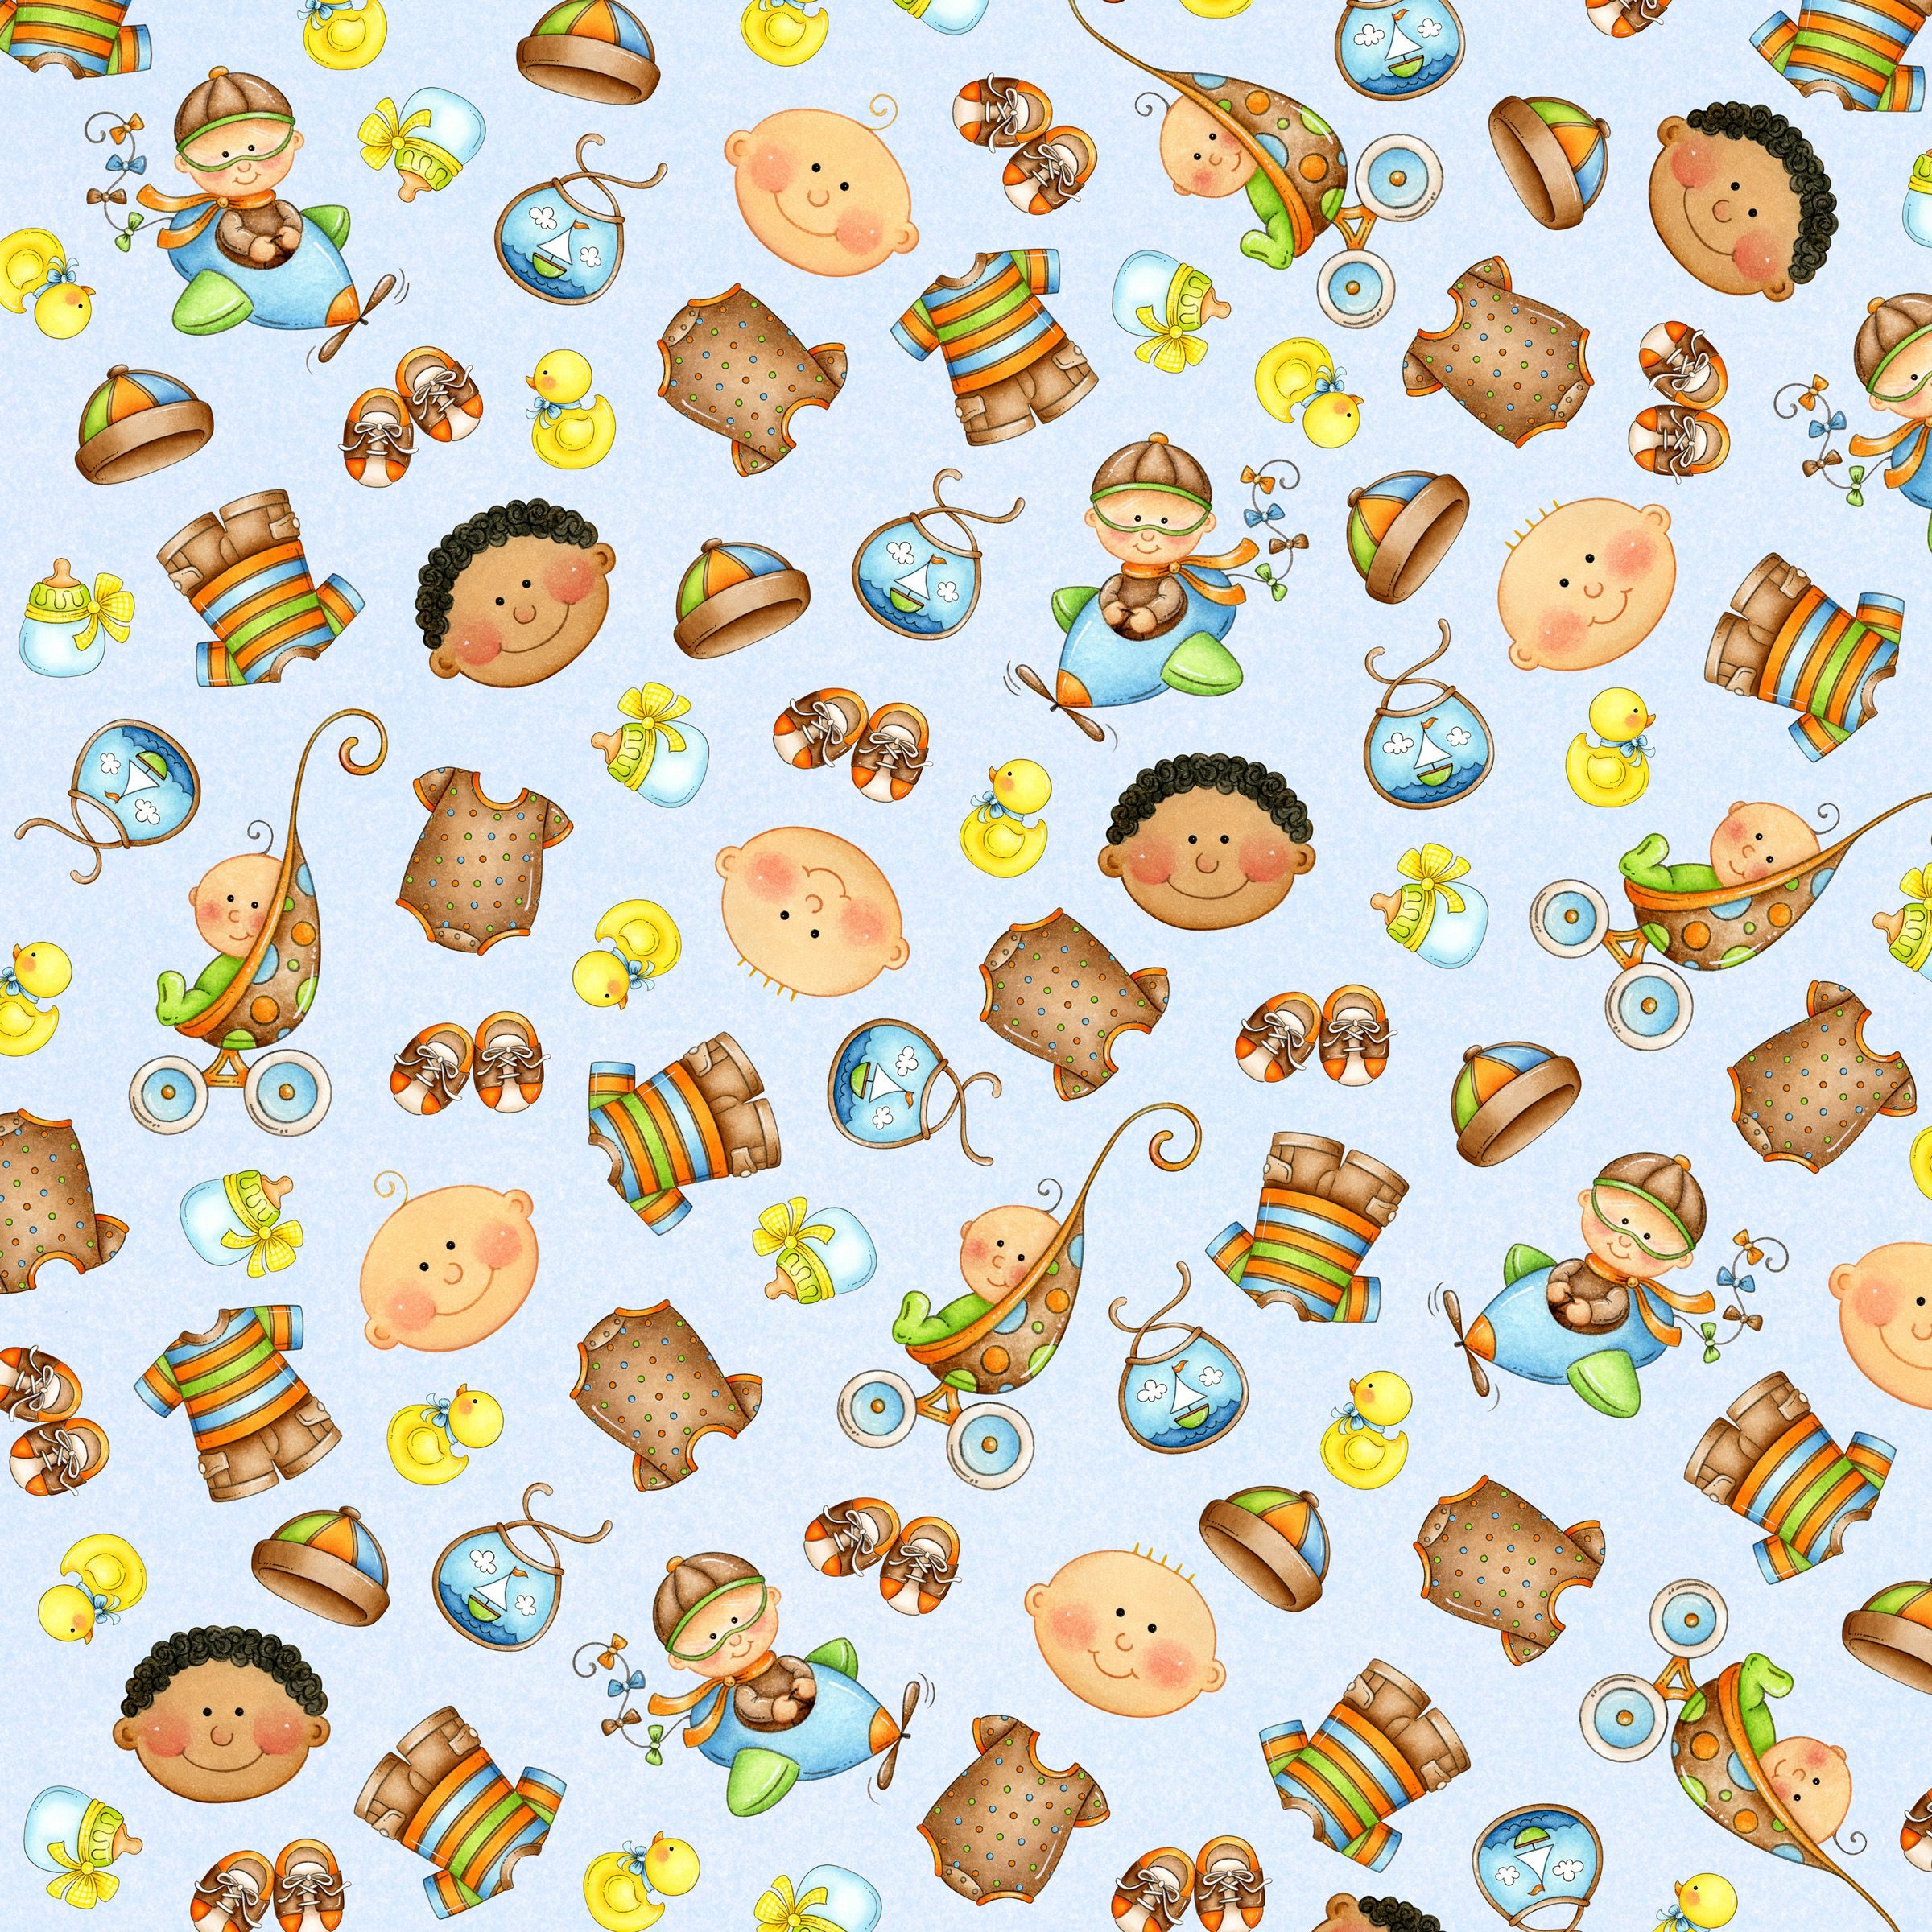 Papel decorado de bebes casas pinterest papel bebe - Hojas decoradas para ninas ...